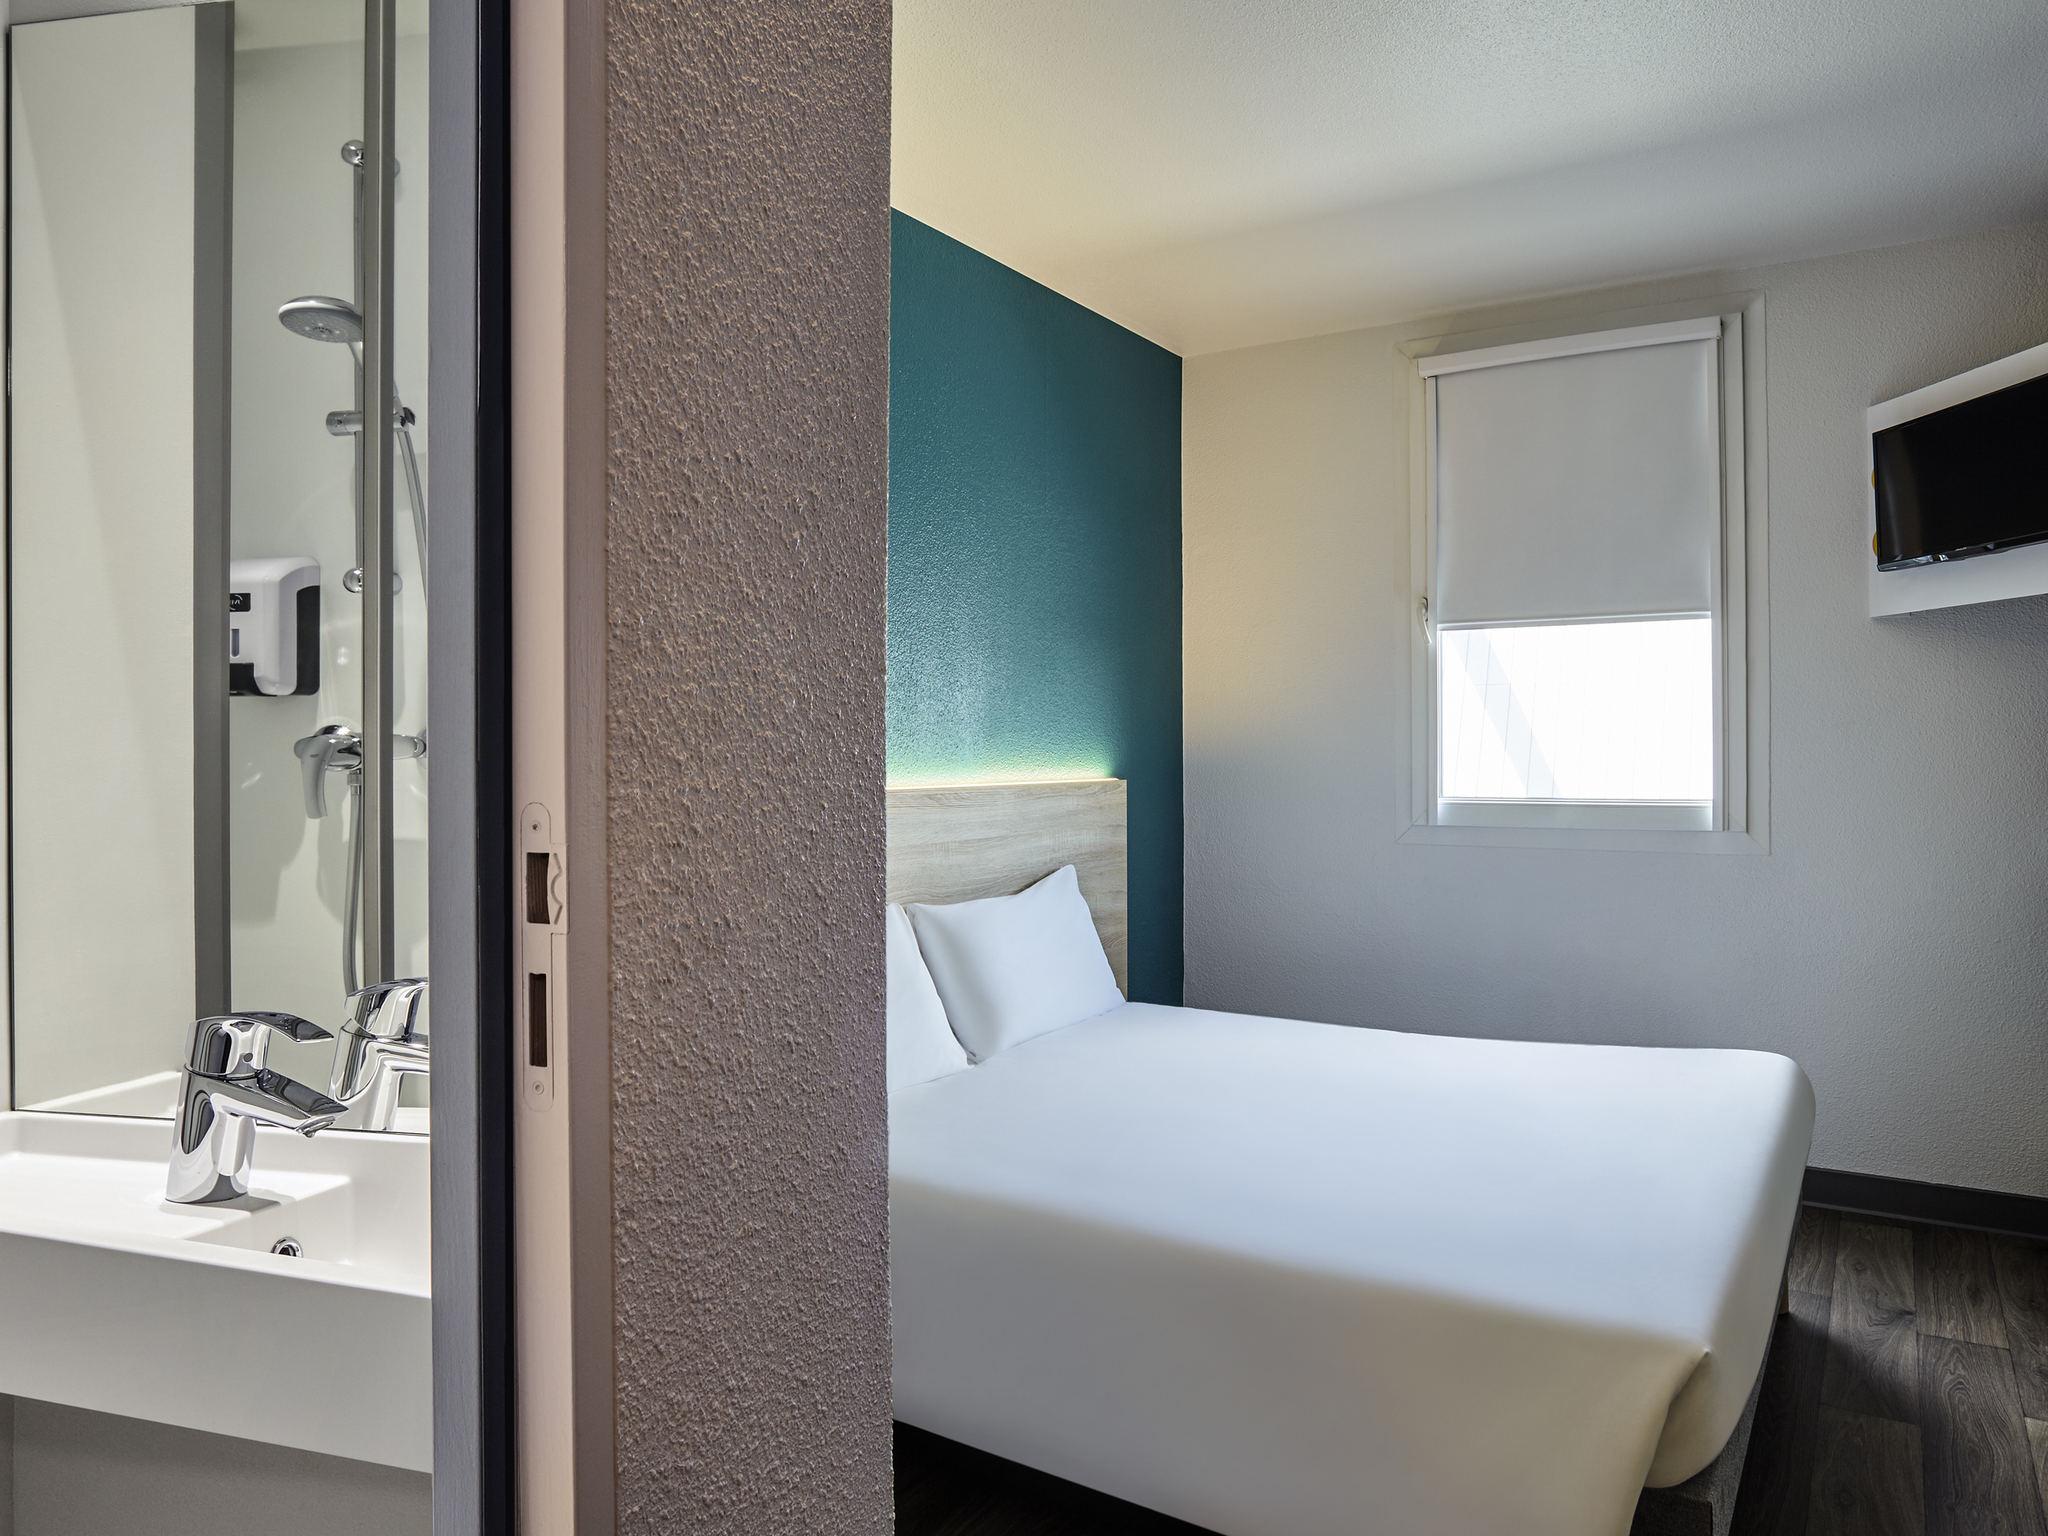 Hotel in paris hotelf1 paris porte de ch tillon - Hotel formule 1 paris porte de chatillon ...